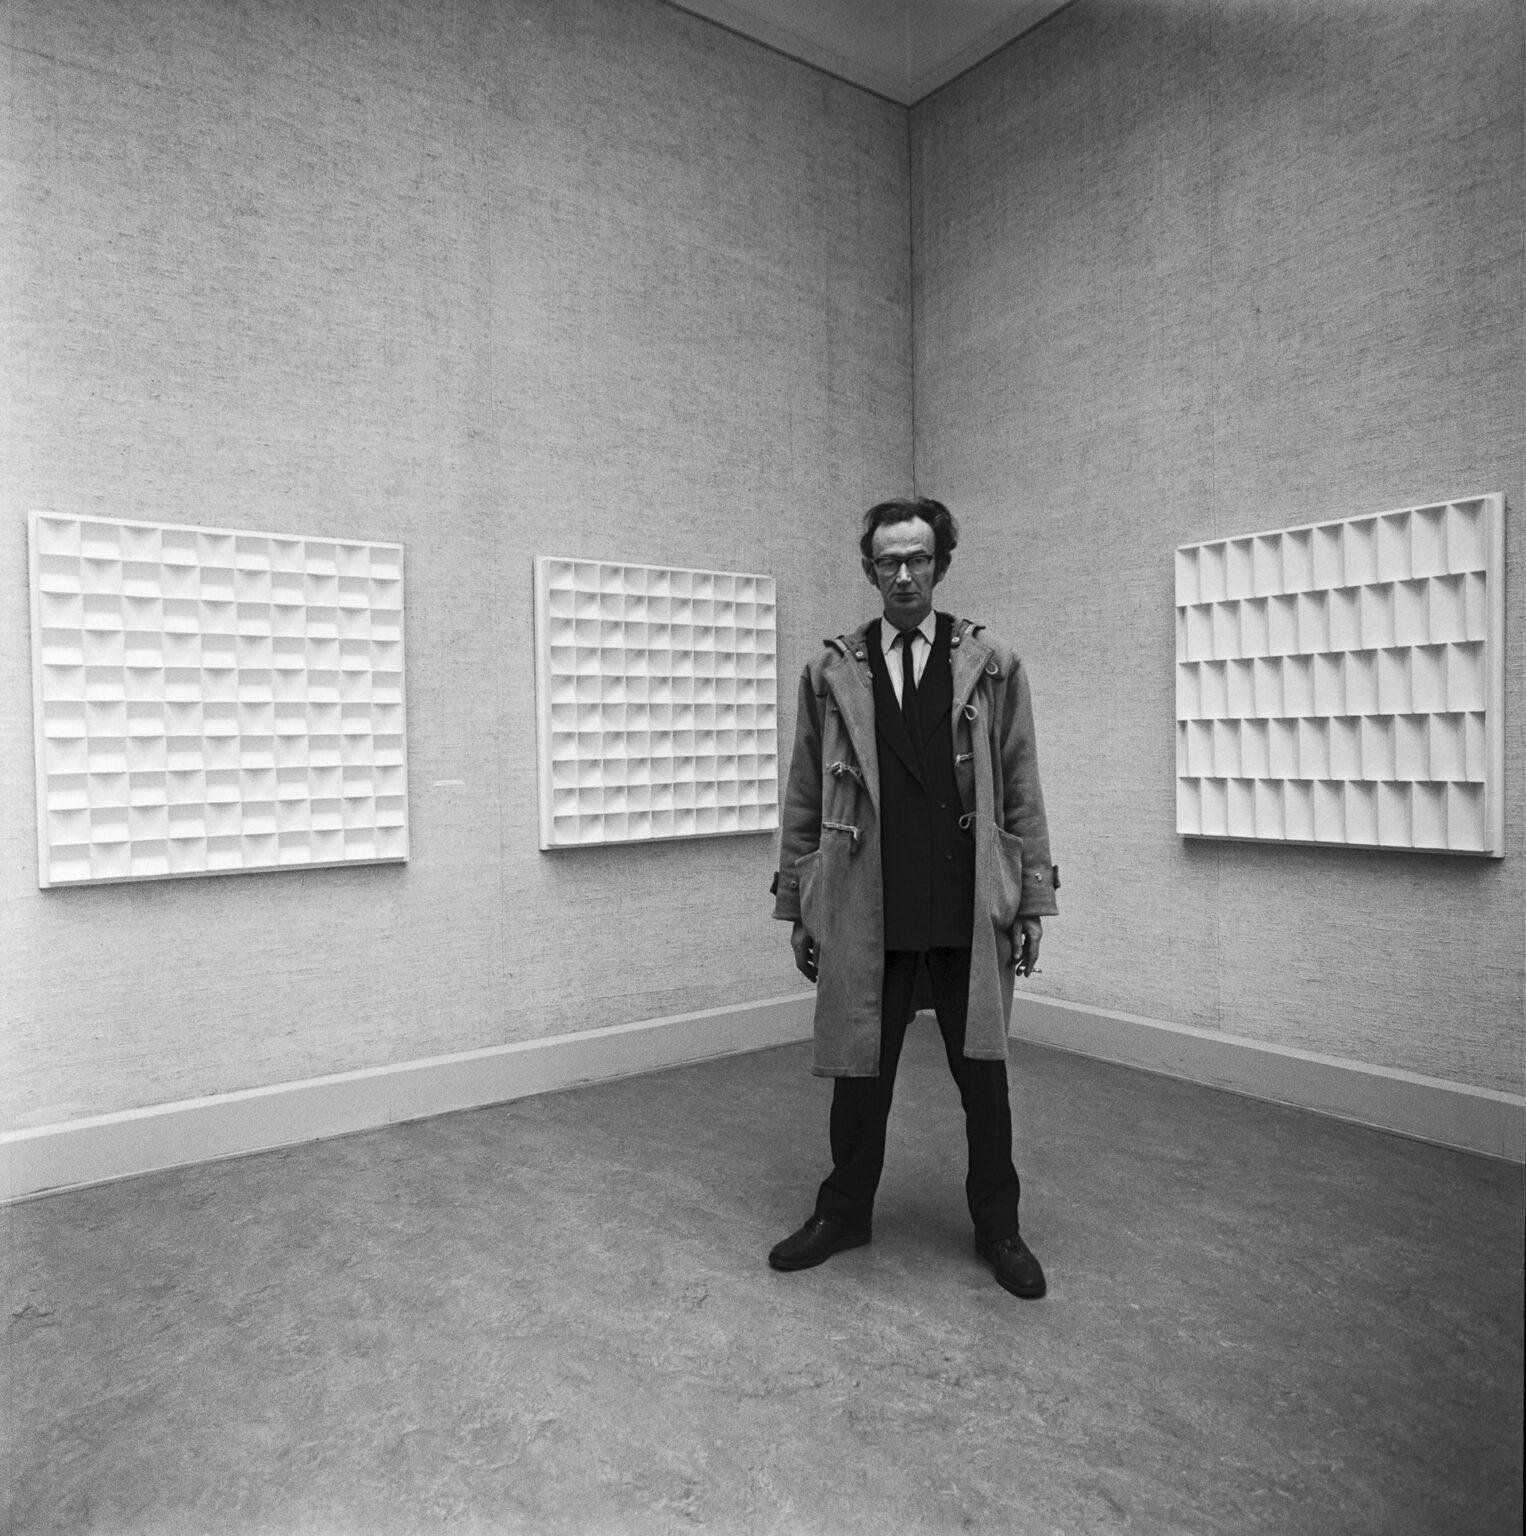 Jan Schoonhoven, by Lothar Wolleh